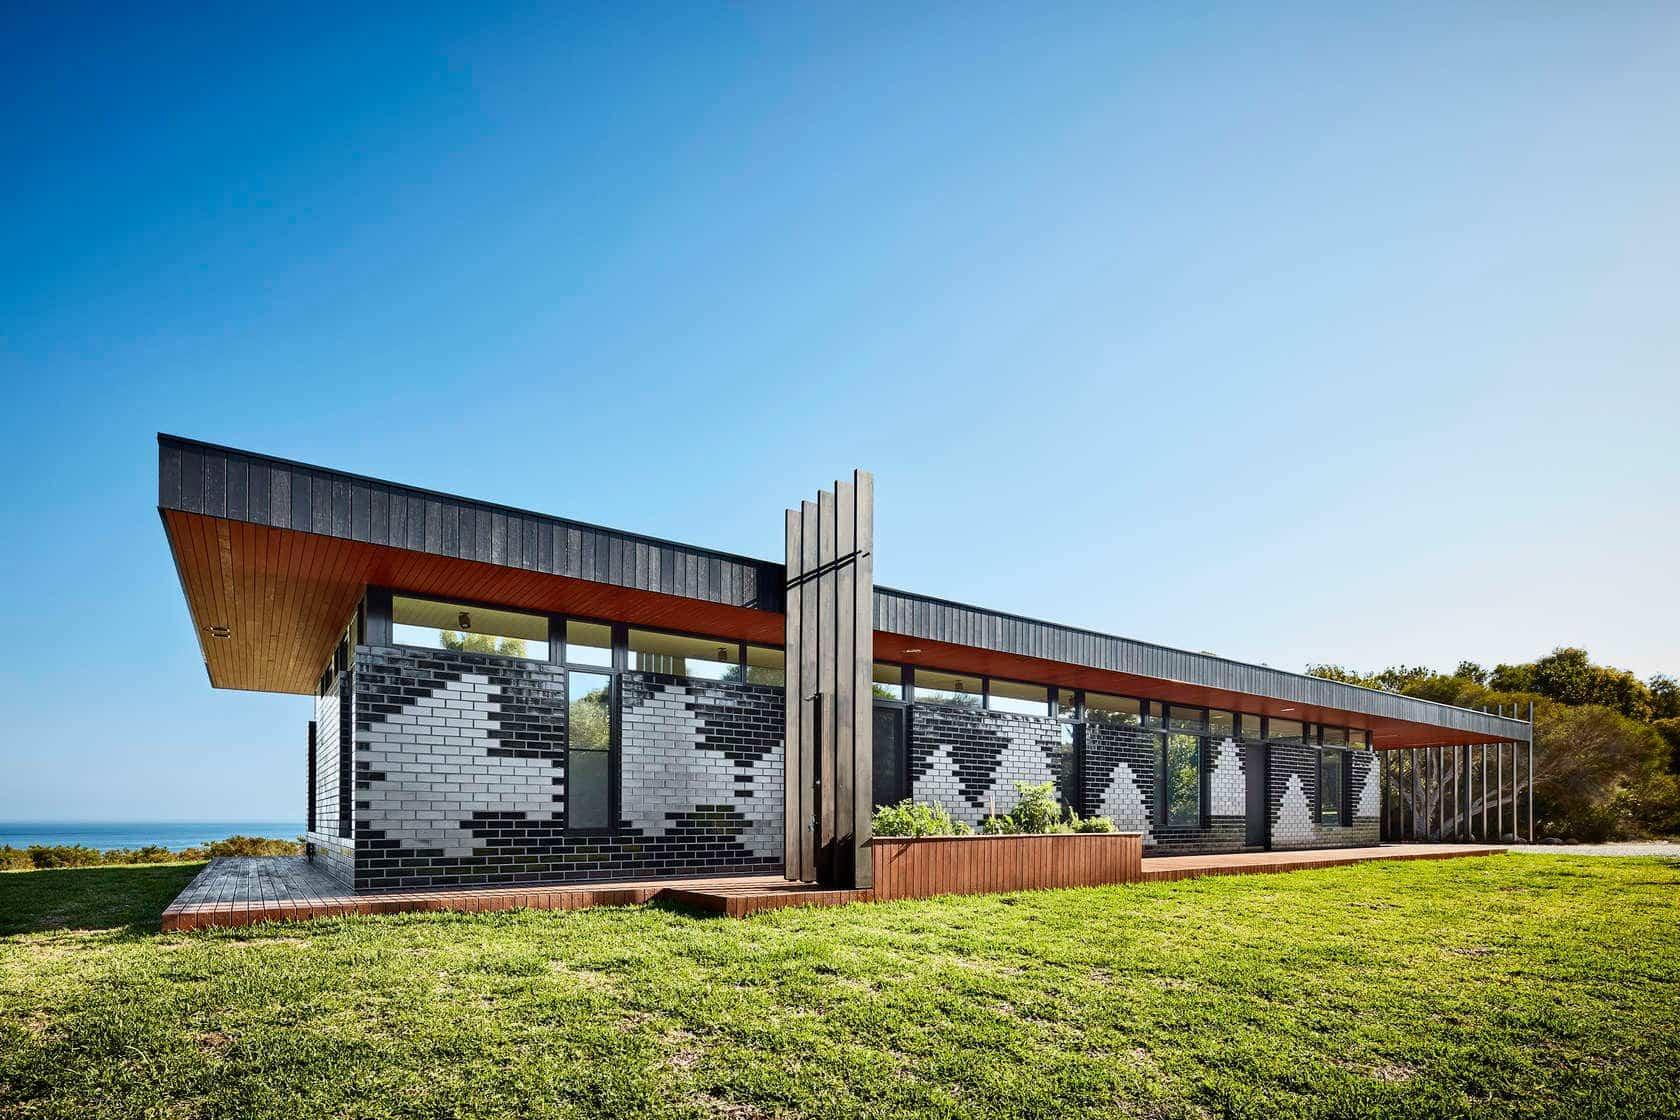 casa moderna en Australia inspirada en las aves